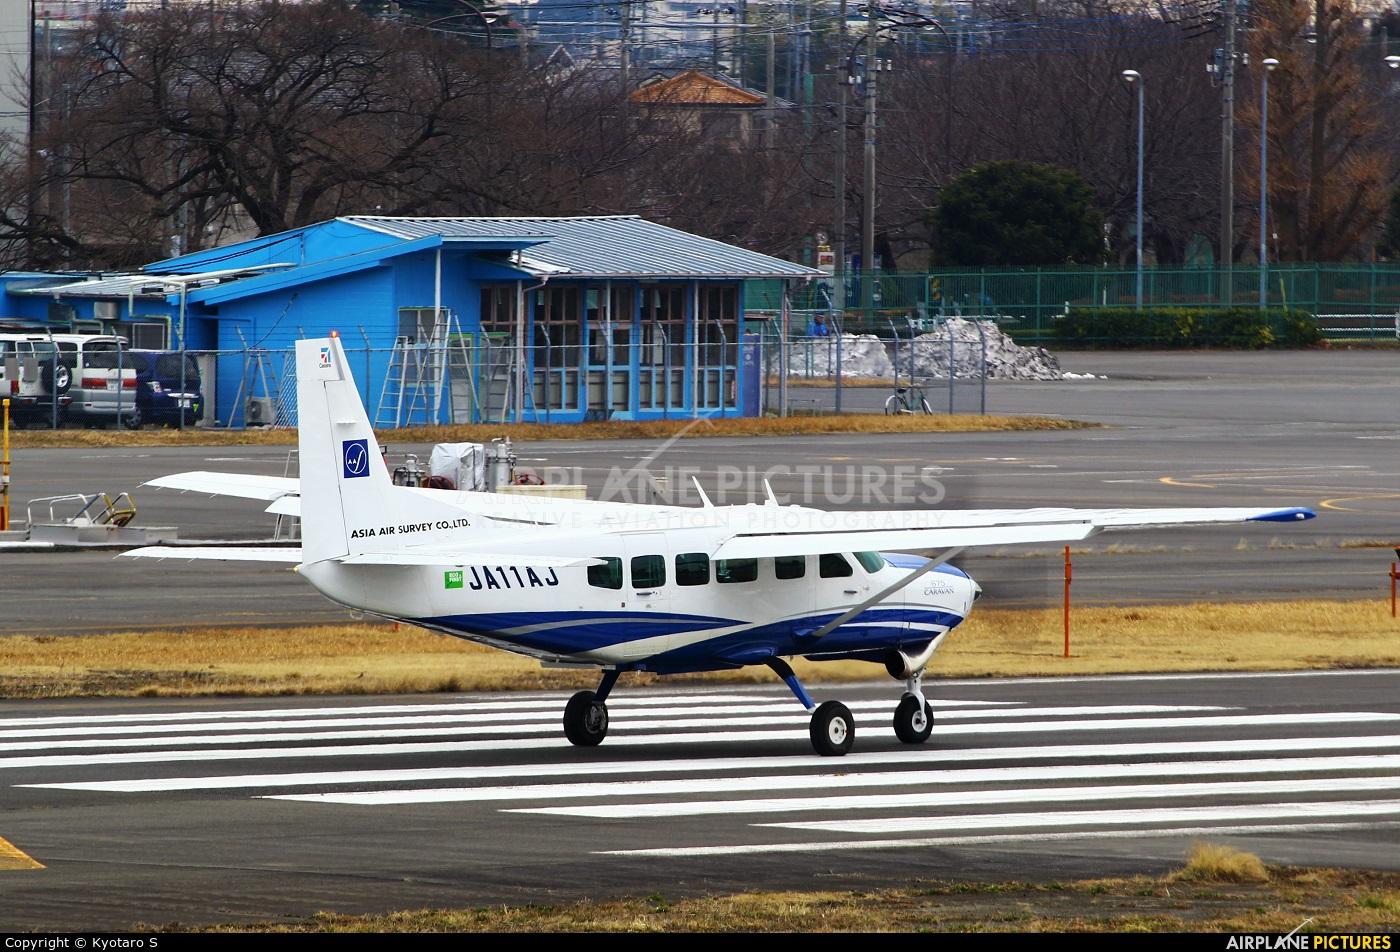 Asia Air Survey Co.Ltd JA11AJ aircraft at Chofu